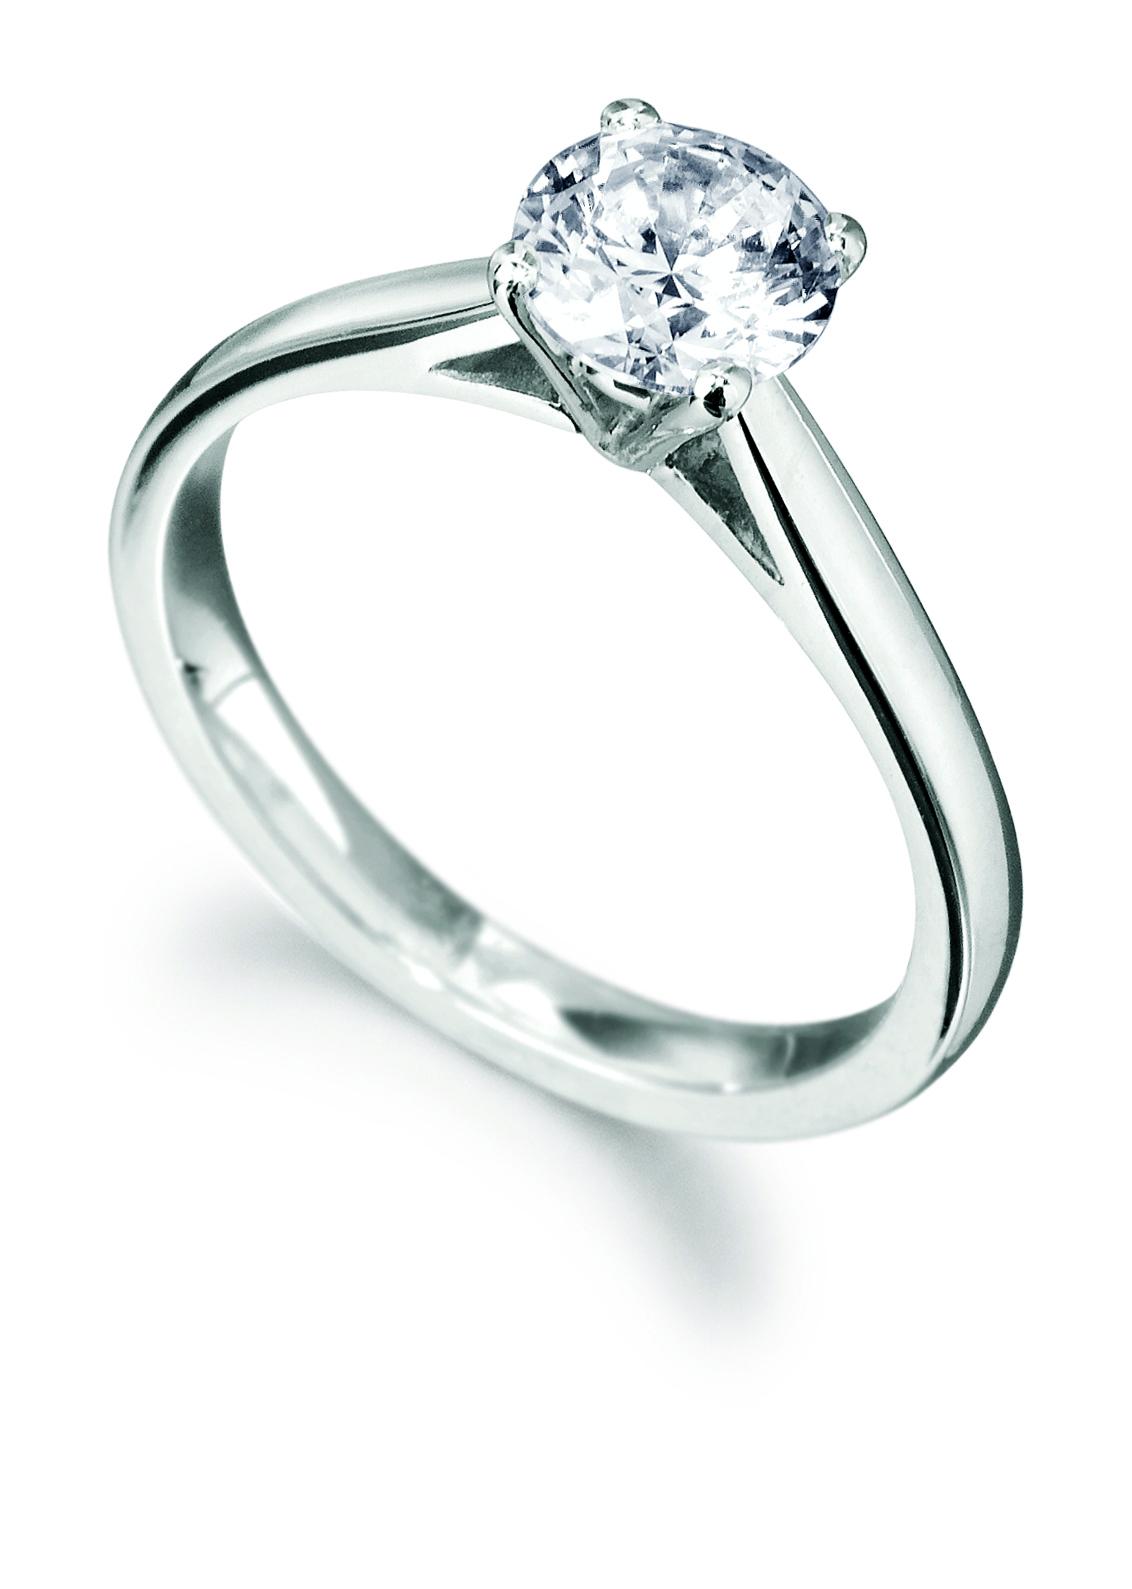 0.71ct Brilliant Cut Diamond Solitaire Ring